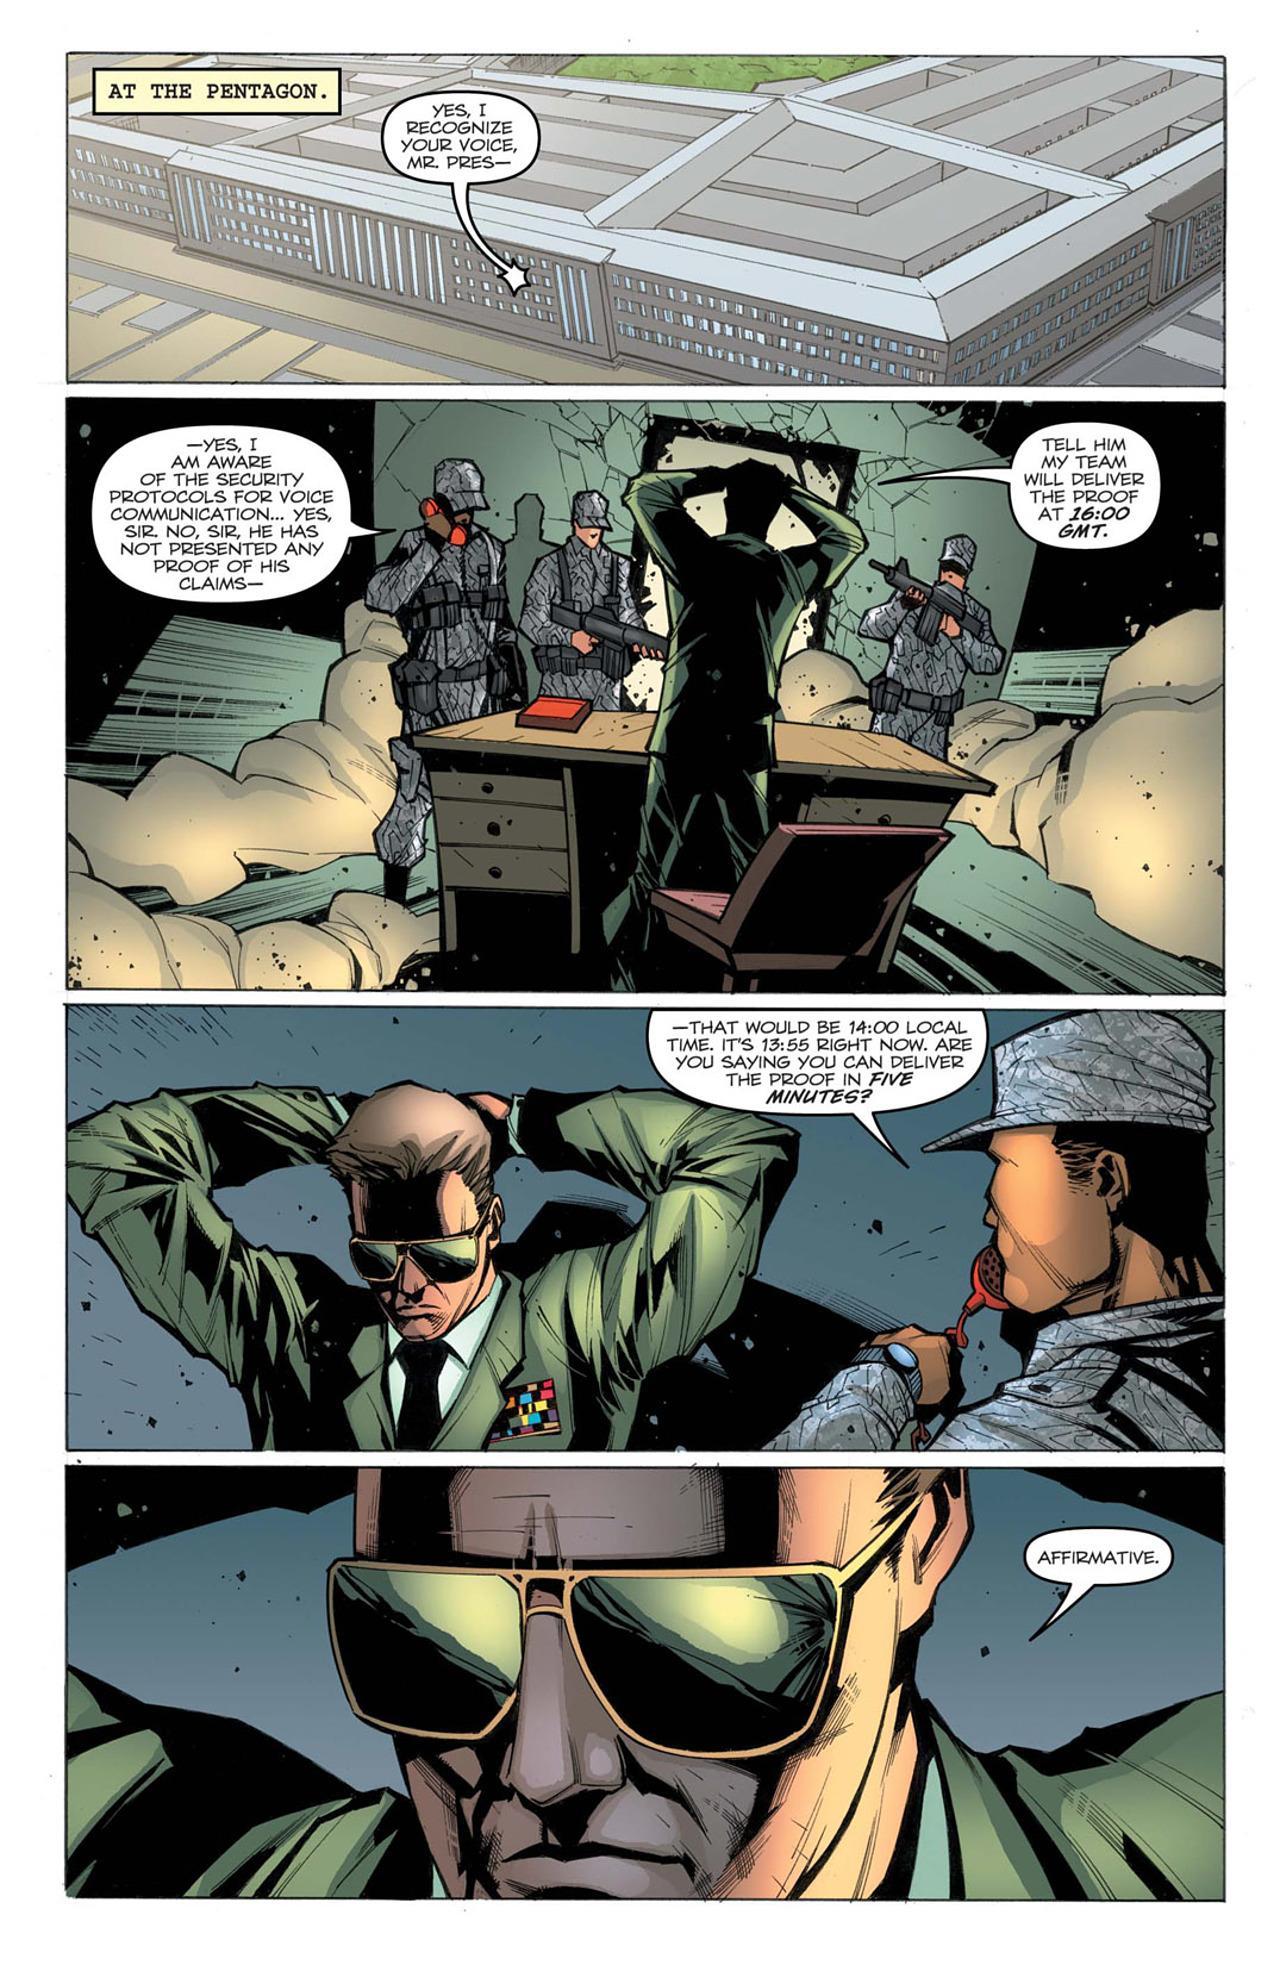 G.I. Joe: A Real American Hero 159 Page 7